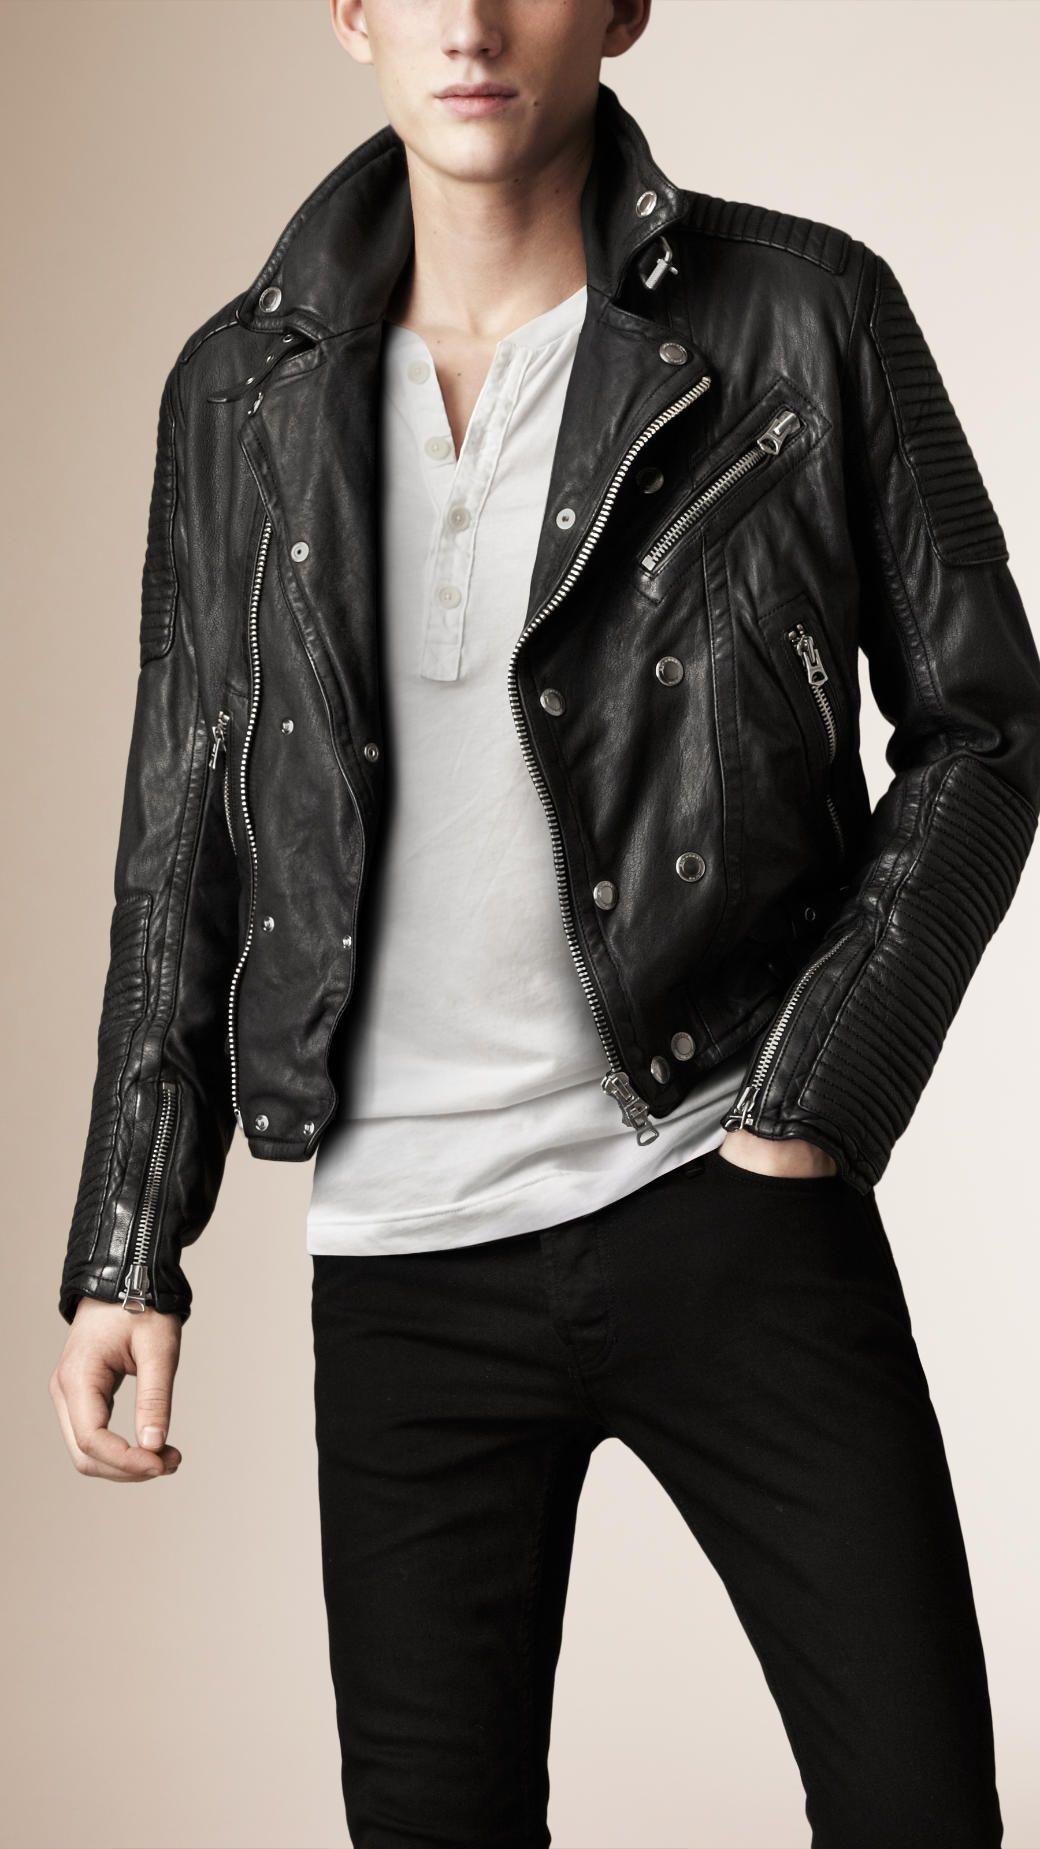 Quilted Panel Biker Jacket Jackets Men Fashion Black Leather Biker Jacket Leather Jacket Men [ 1849 x 1040 Pixel ]